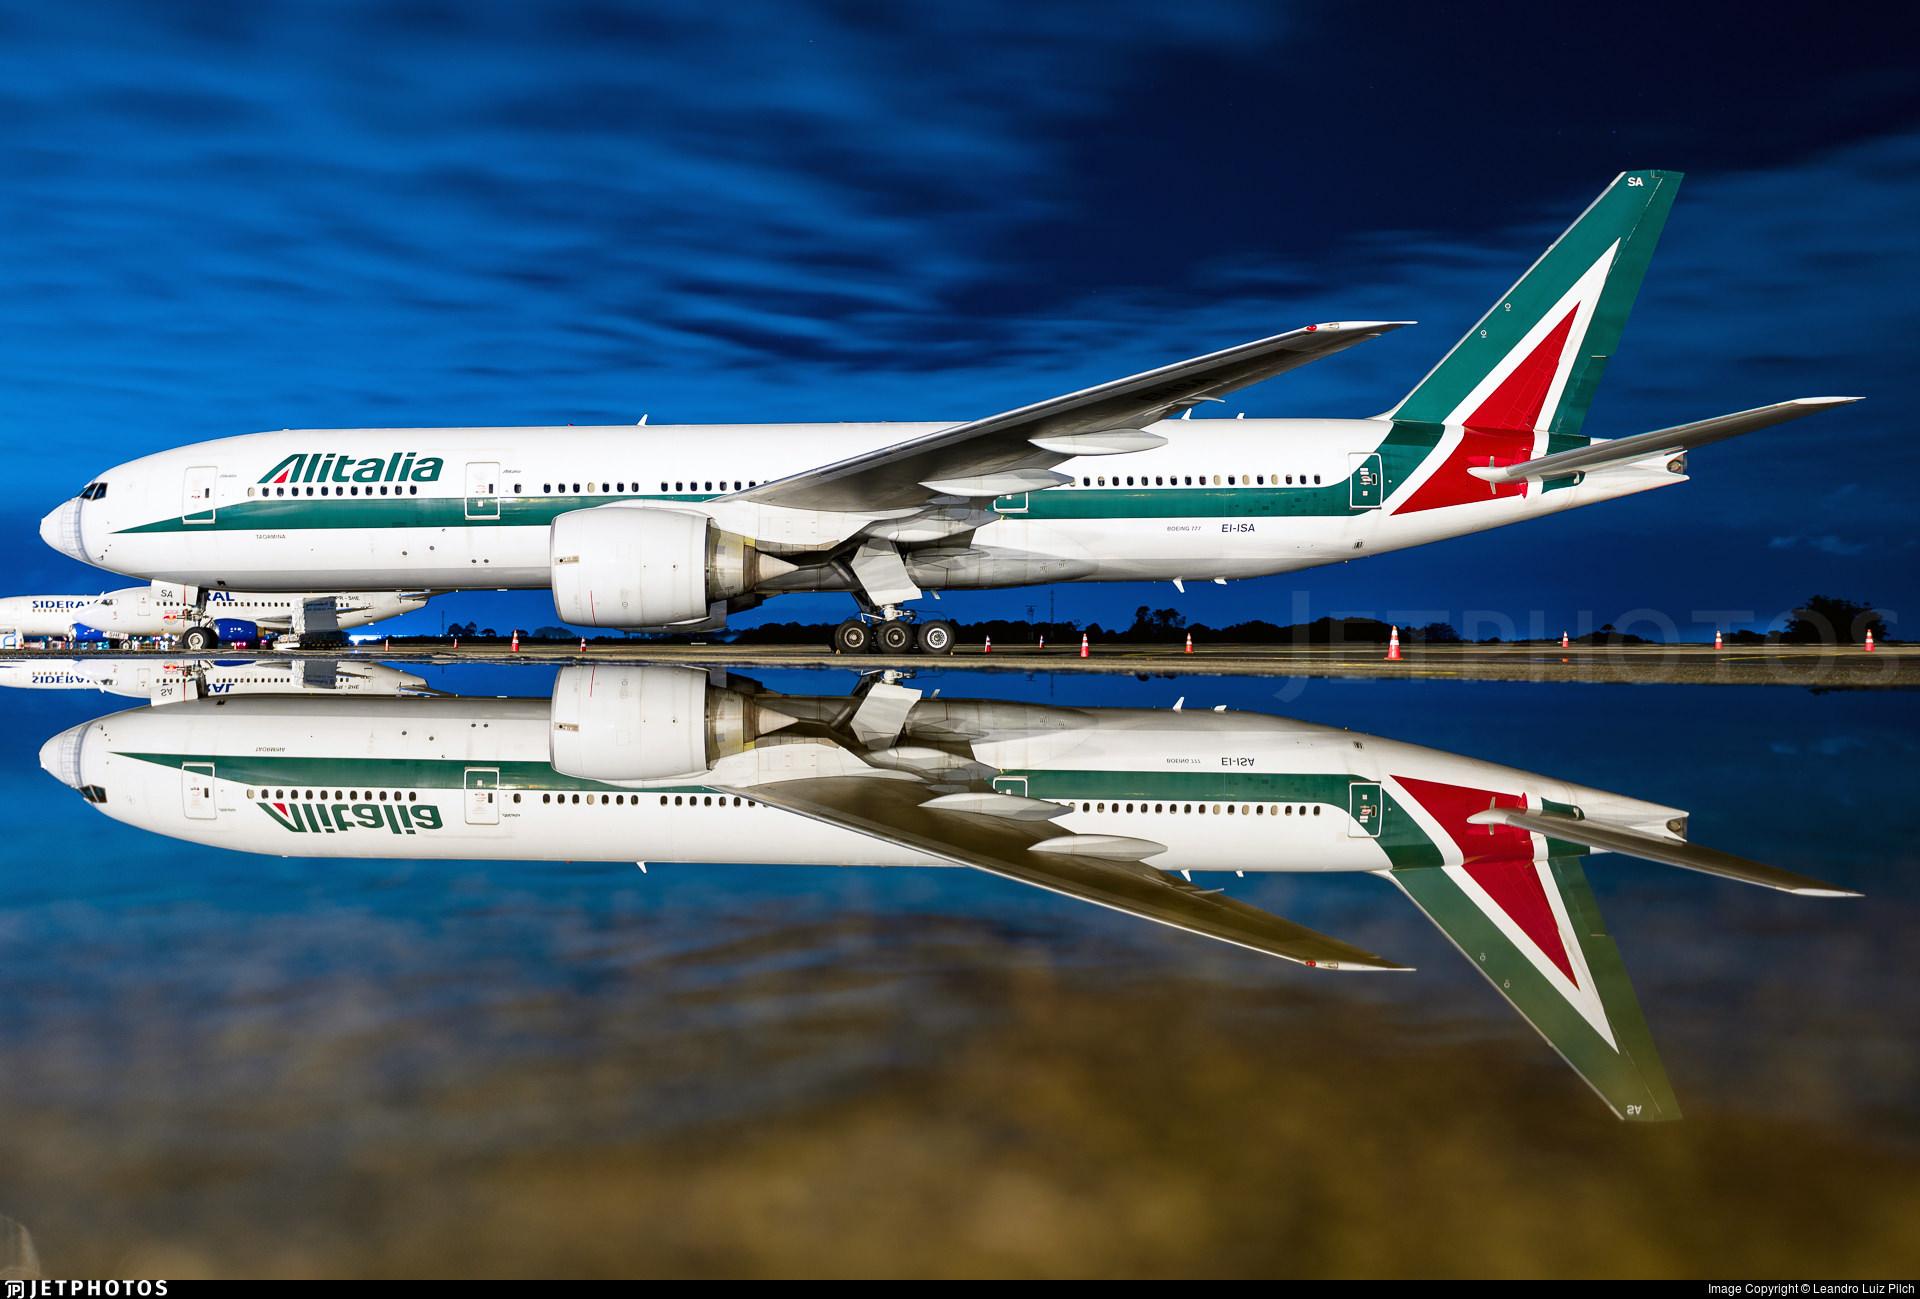 An Alitalia 777 reflecting on wet pavement in Curitiba